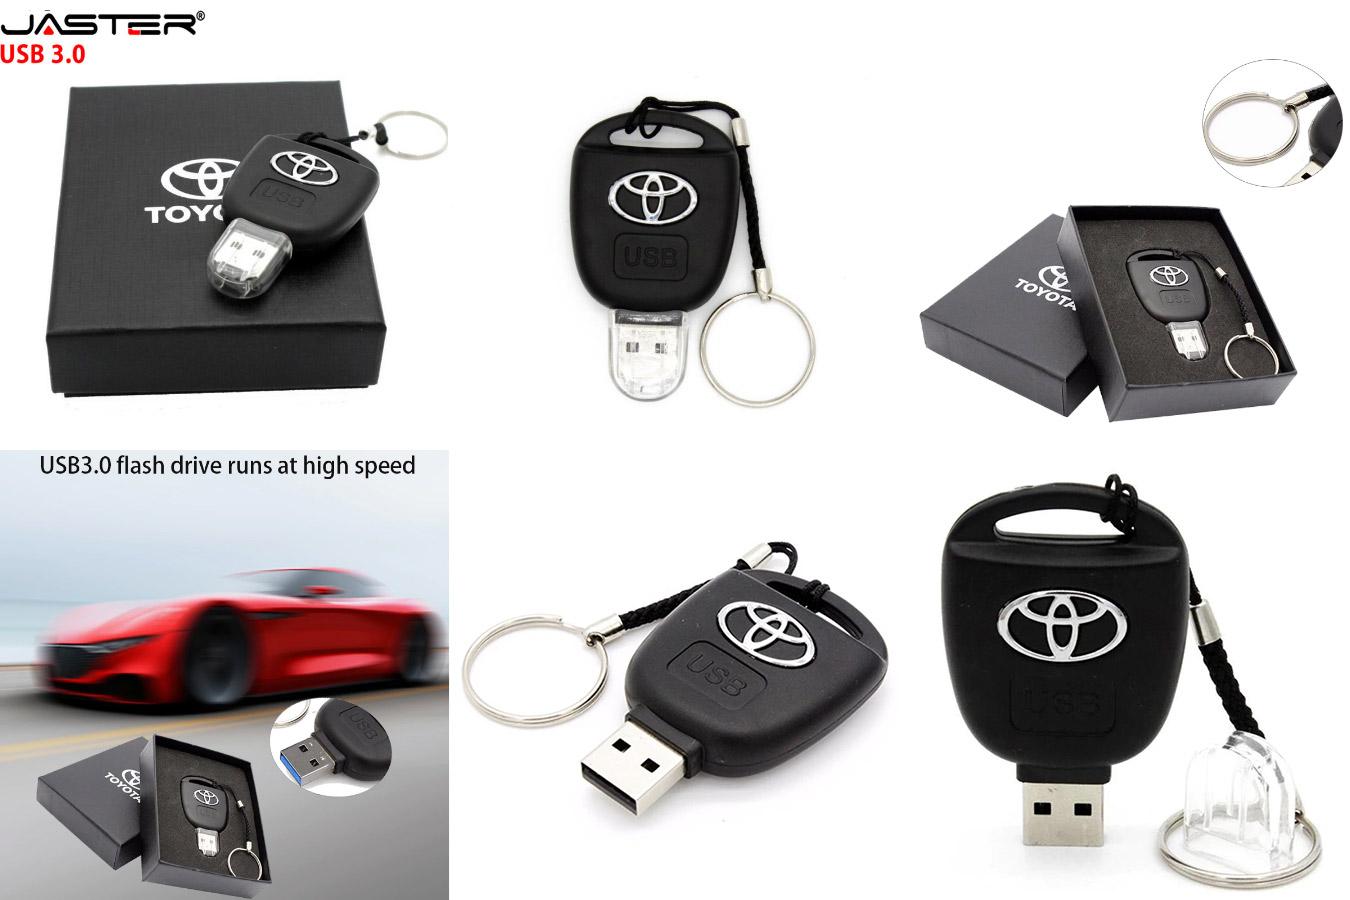 Флешка в виде автомобильного ключа JASTER USB 3.0